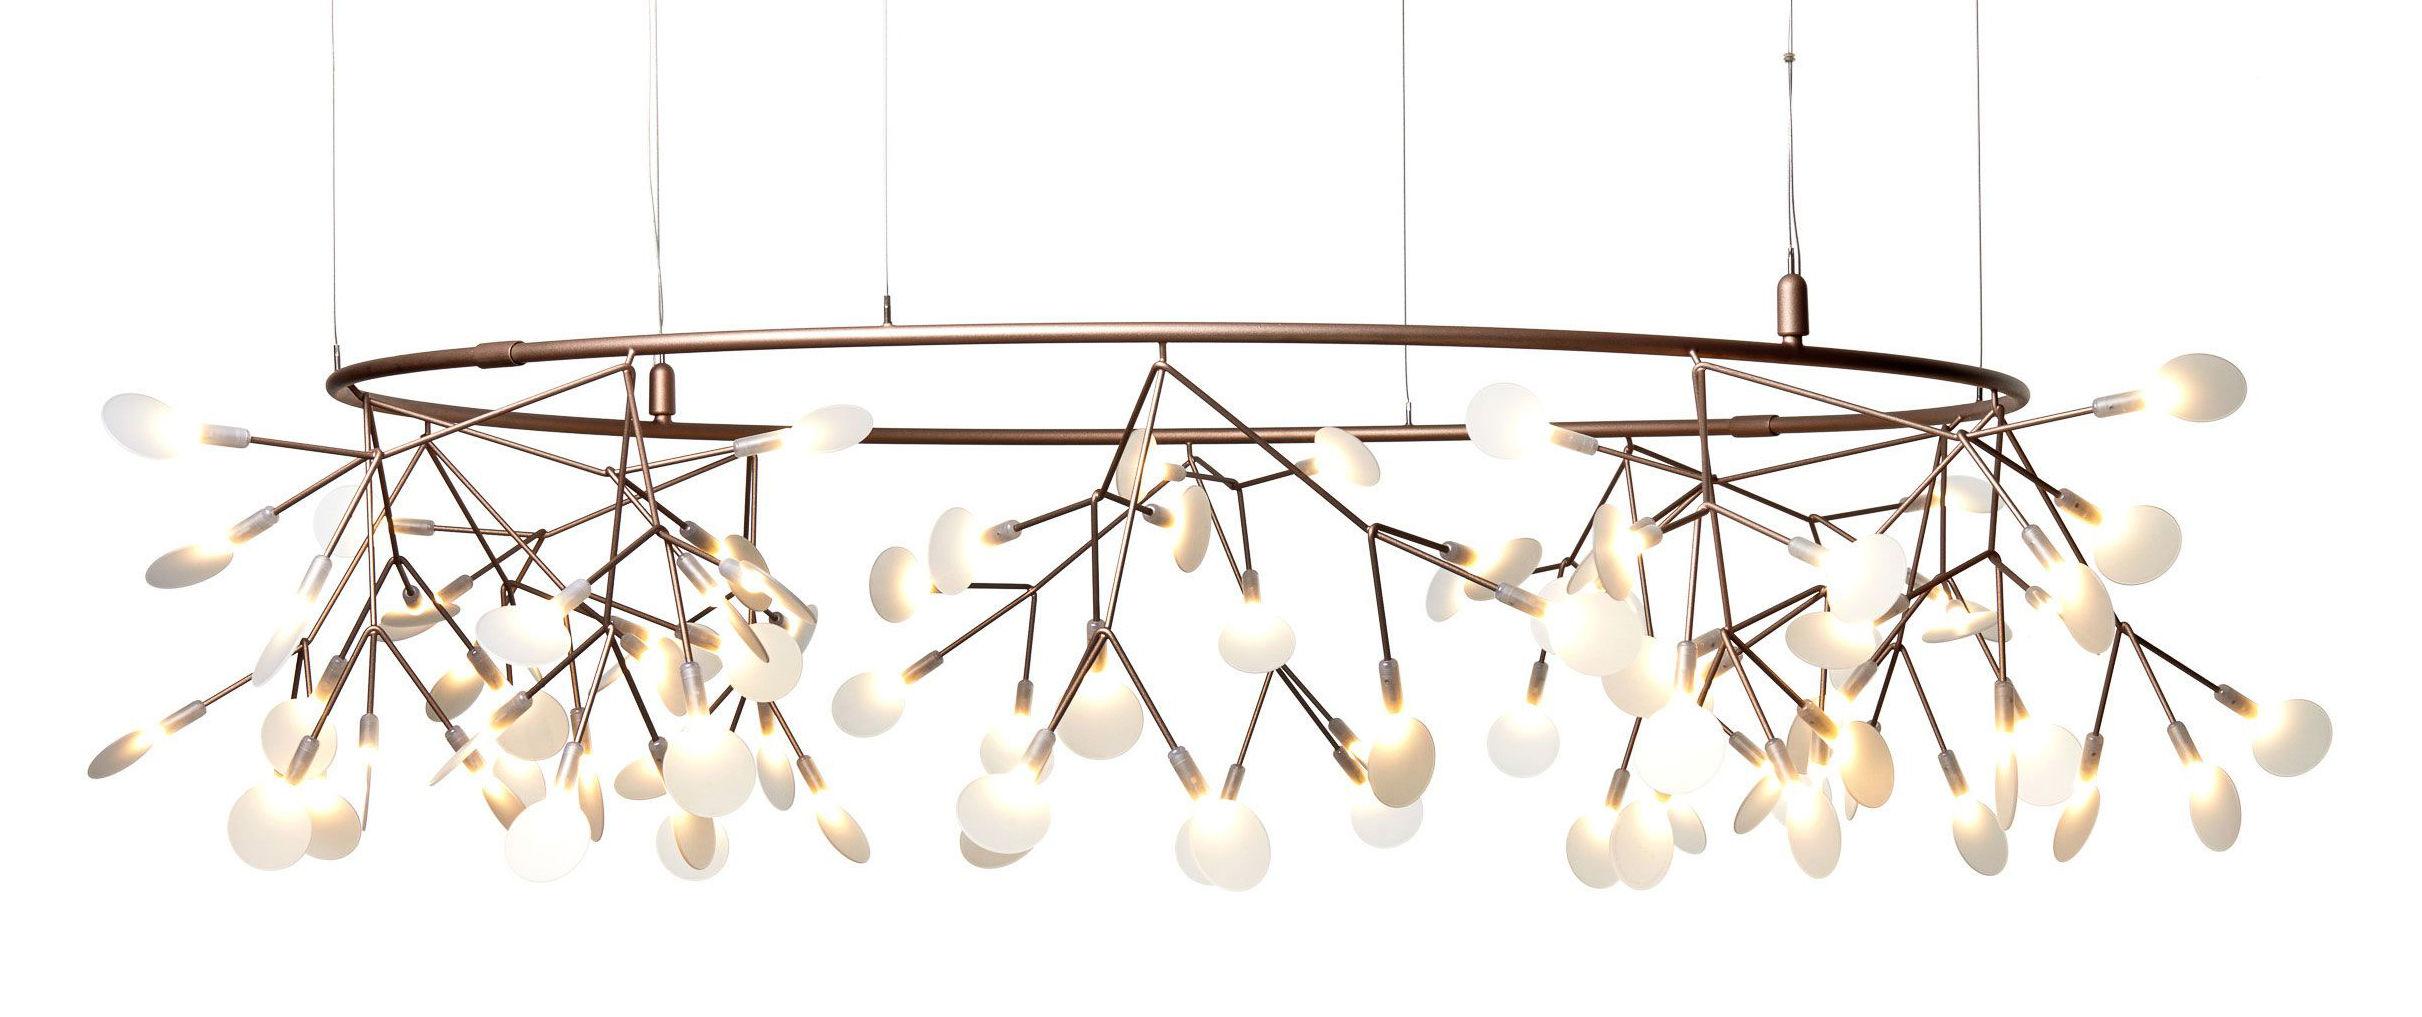 Luminaire - Suspensions - Suspension Heracleum Small Big O / LED - Ø 160 cm - Moooi - Cuivre - Acier inoxydable, Métal, Polycarbonate